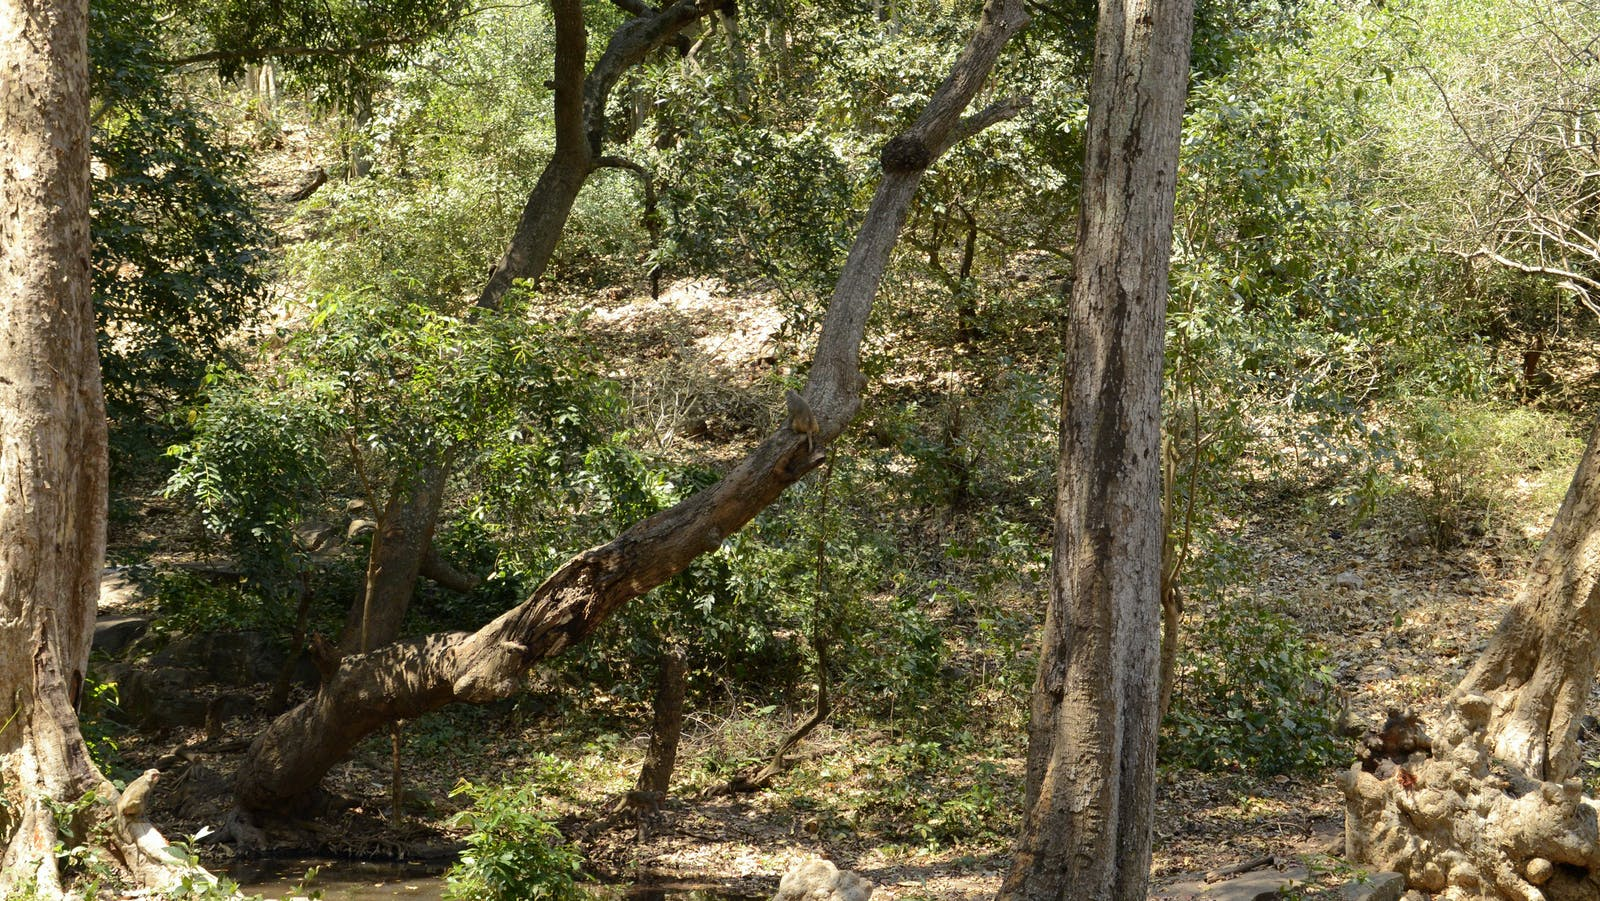 Central Deccan Plateau Dry Deciduous Forests